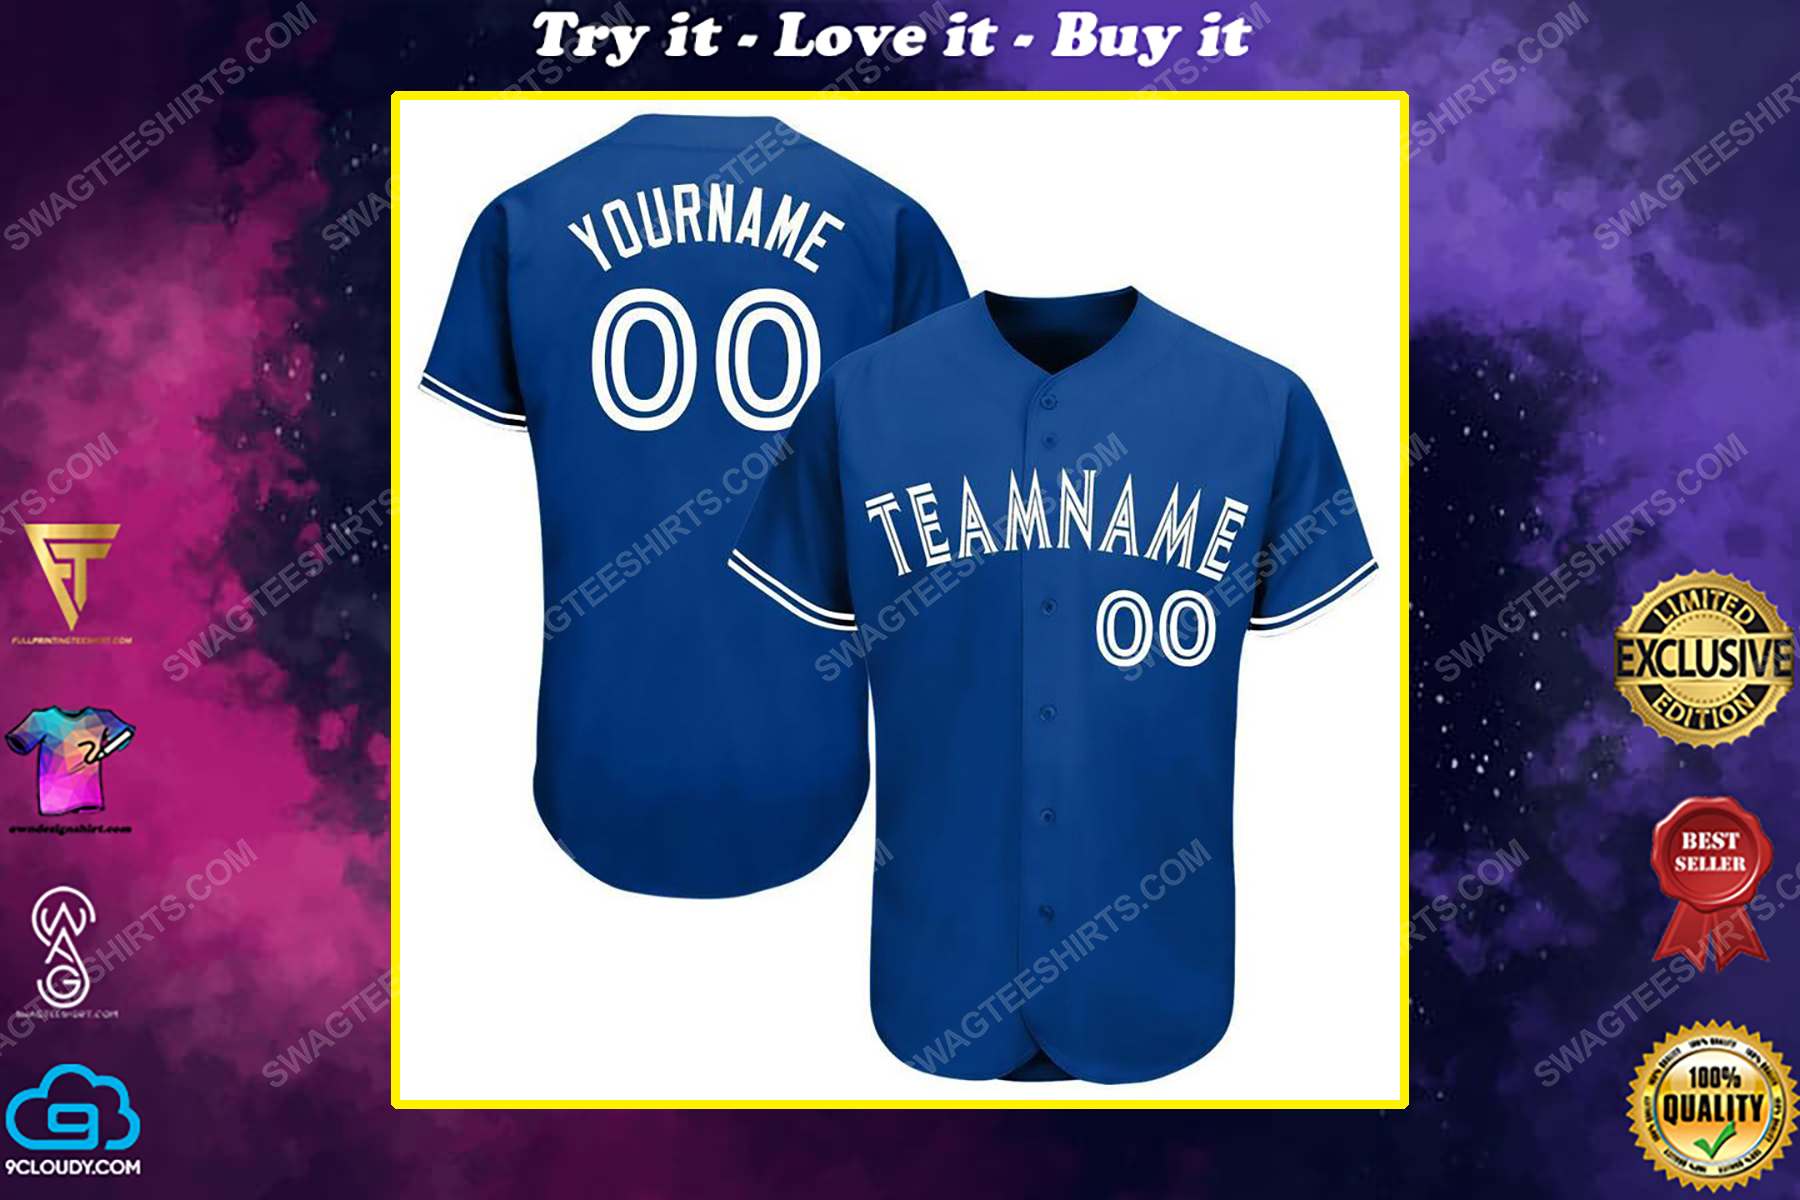 Custom team name toronto blue jays full printed baseball jersey